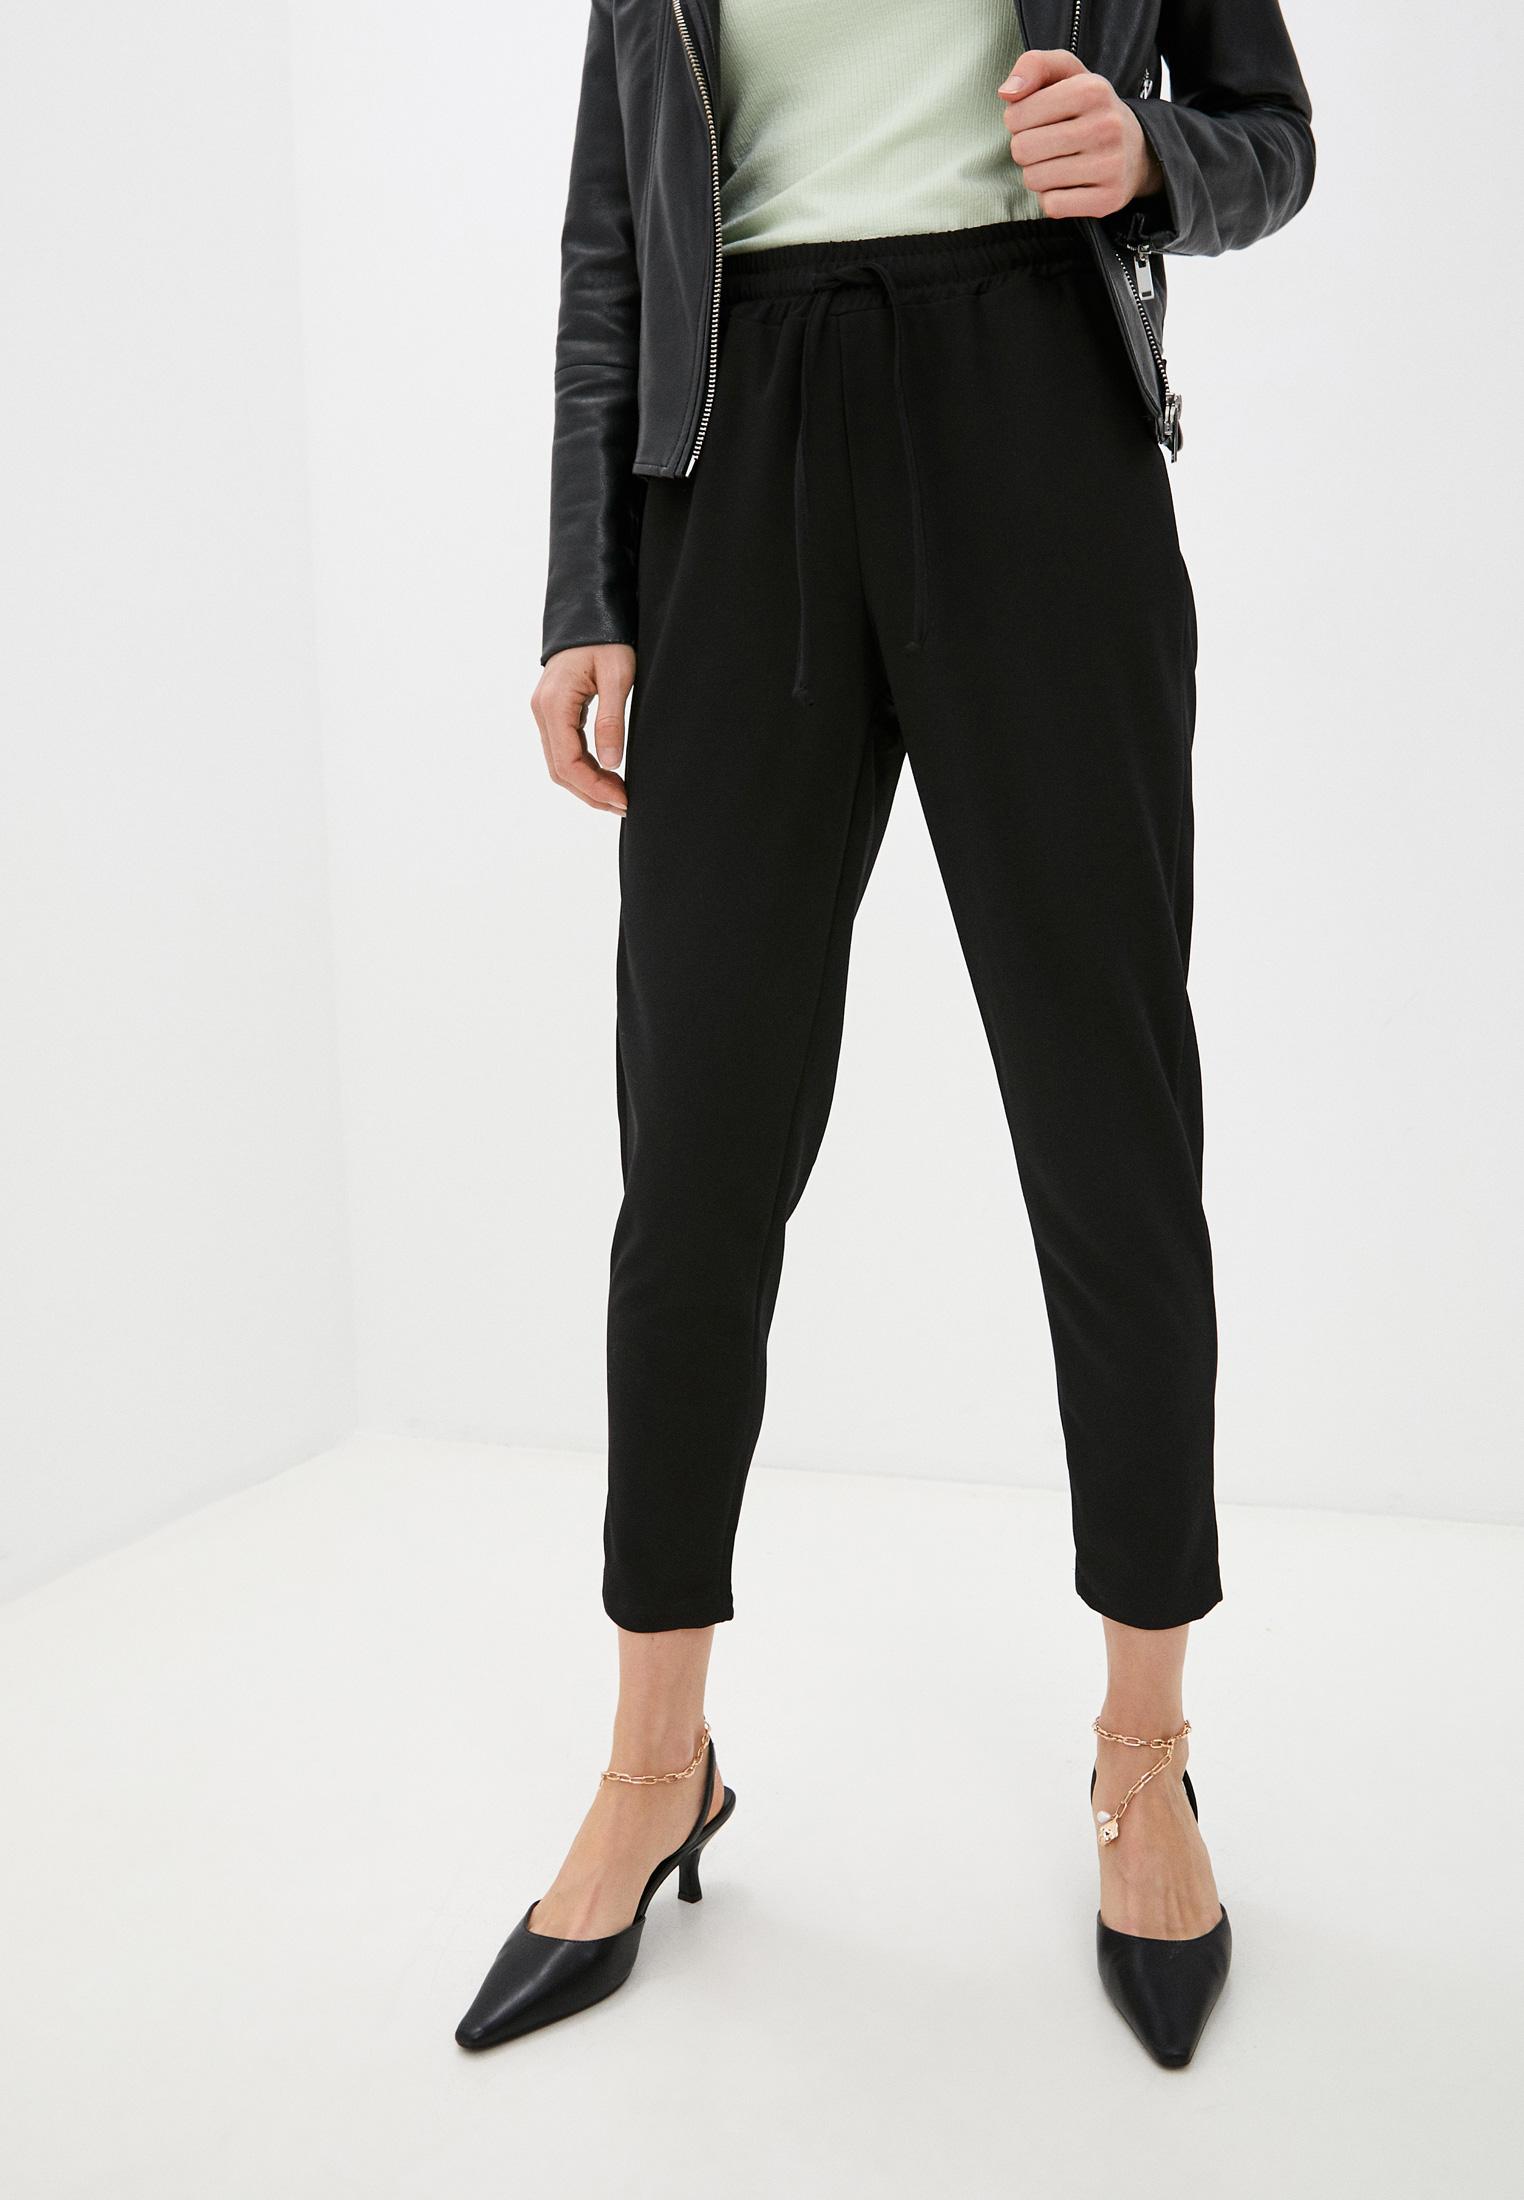 Женские зауженные брюки Haily's Брюки Haily's